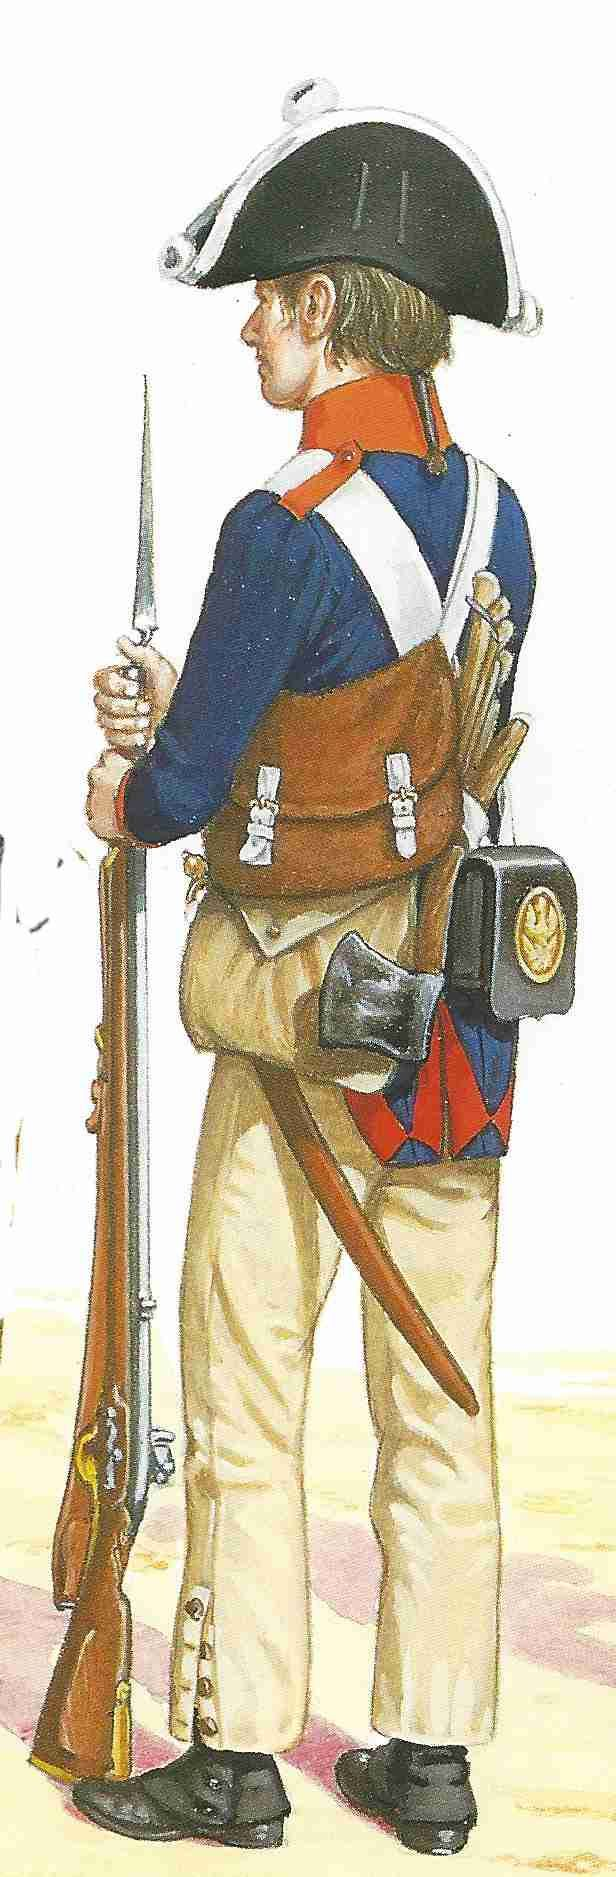 Prussian Rifleman 2nd Infantry Regiment 1806